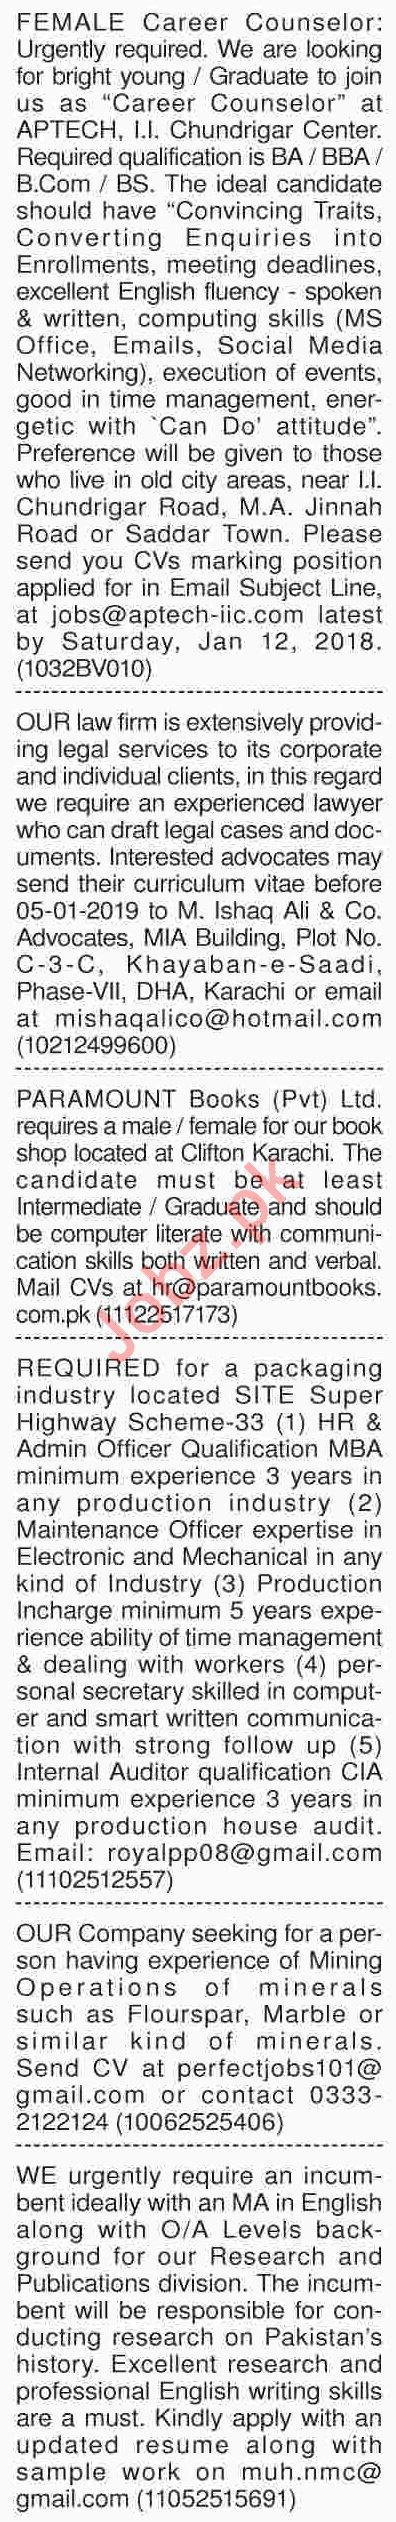 Dawn Sunday Newspaper General Classified Ads 30/12/2018